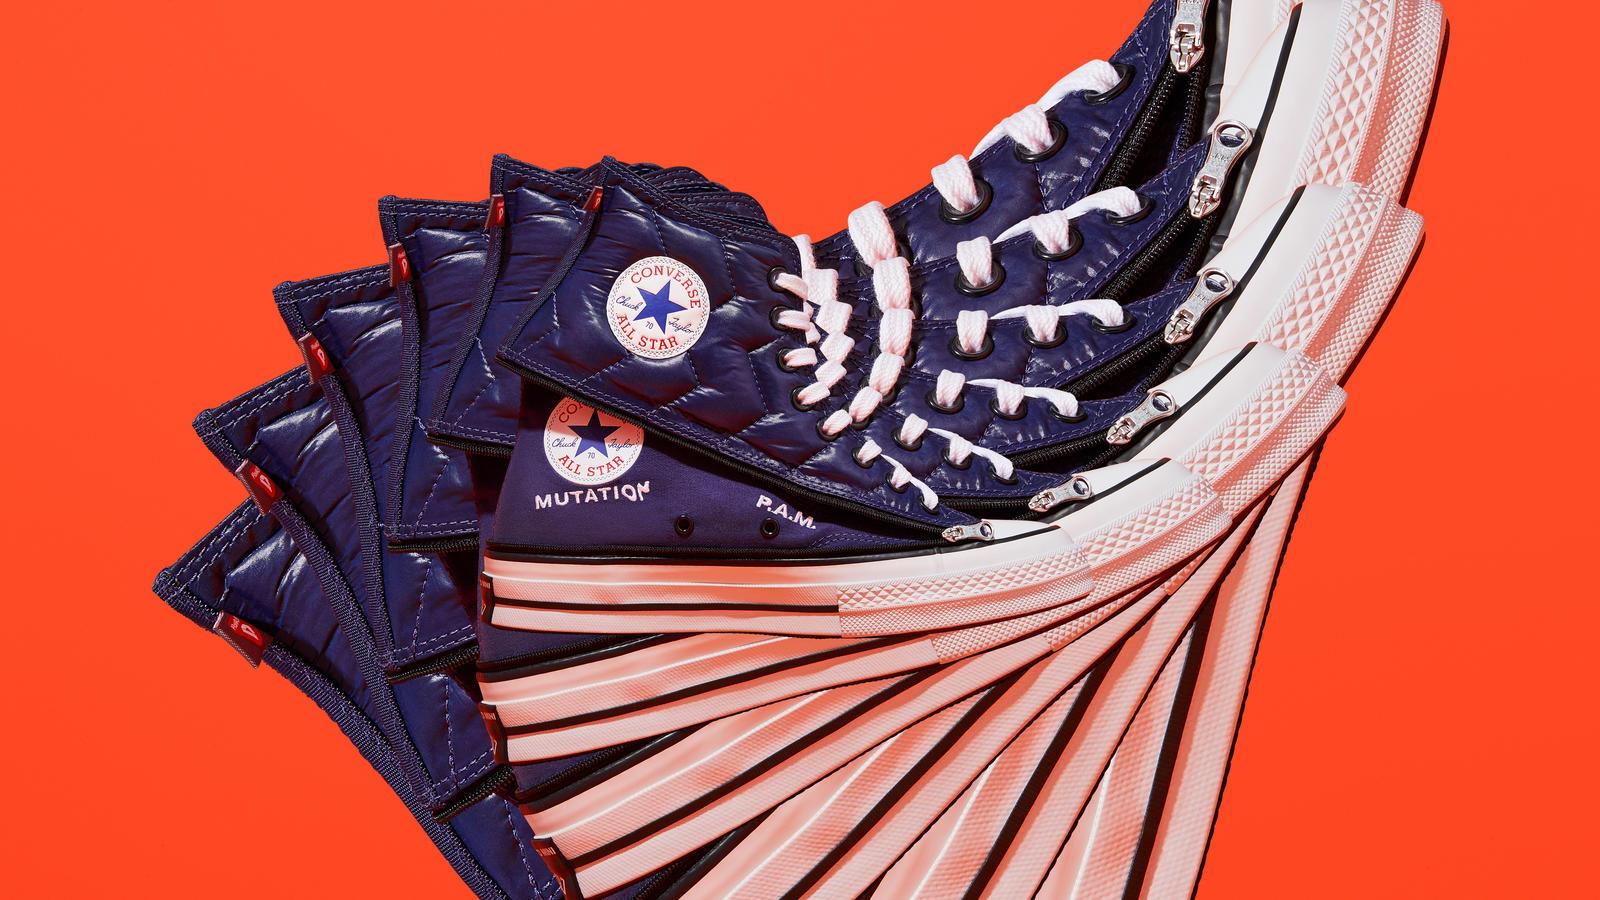 Converse pam 2019 2388 pam sneaker collage hd 1600